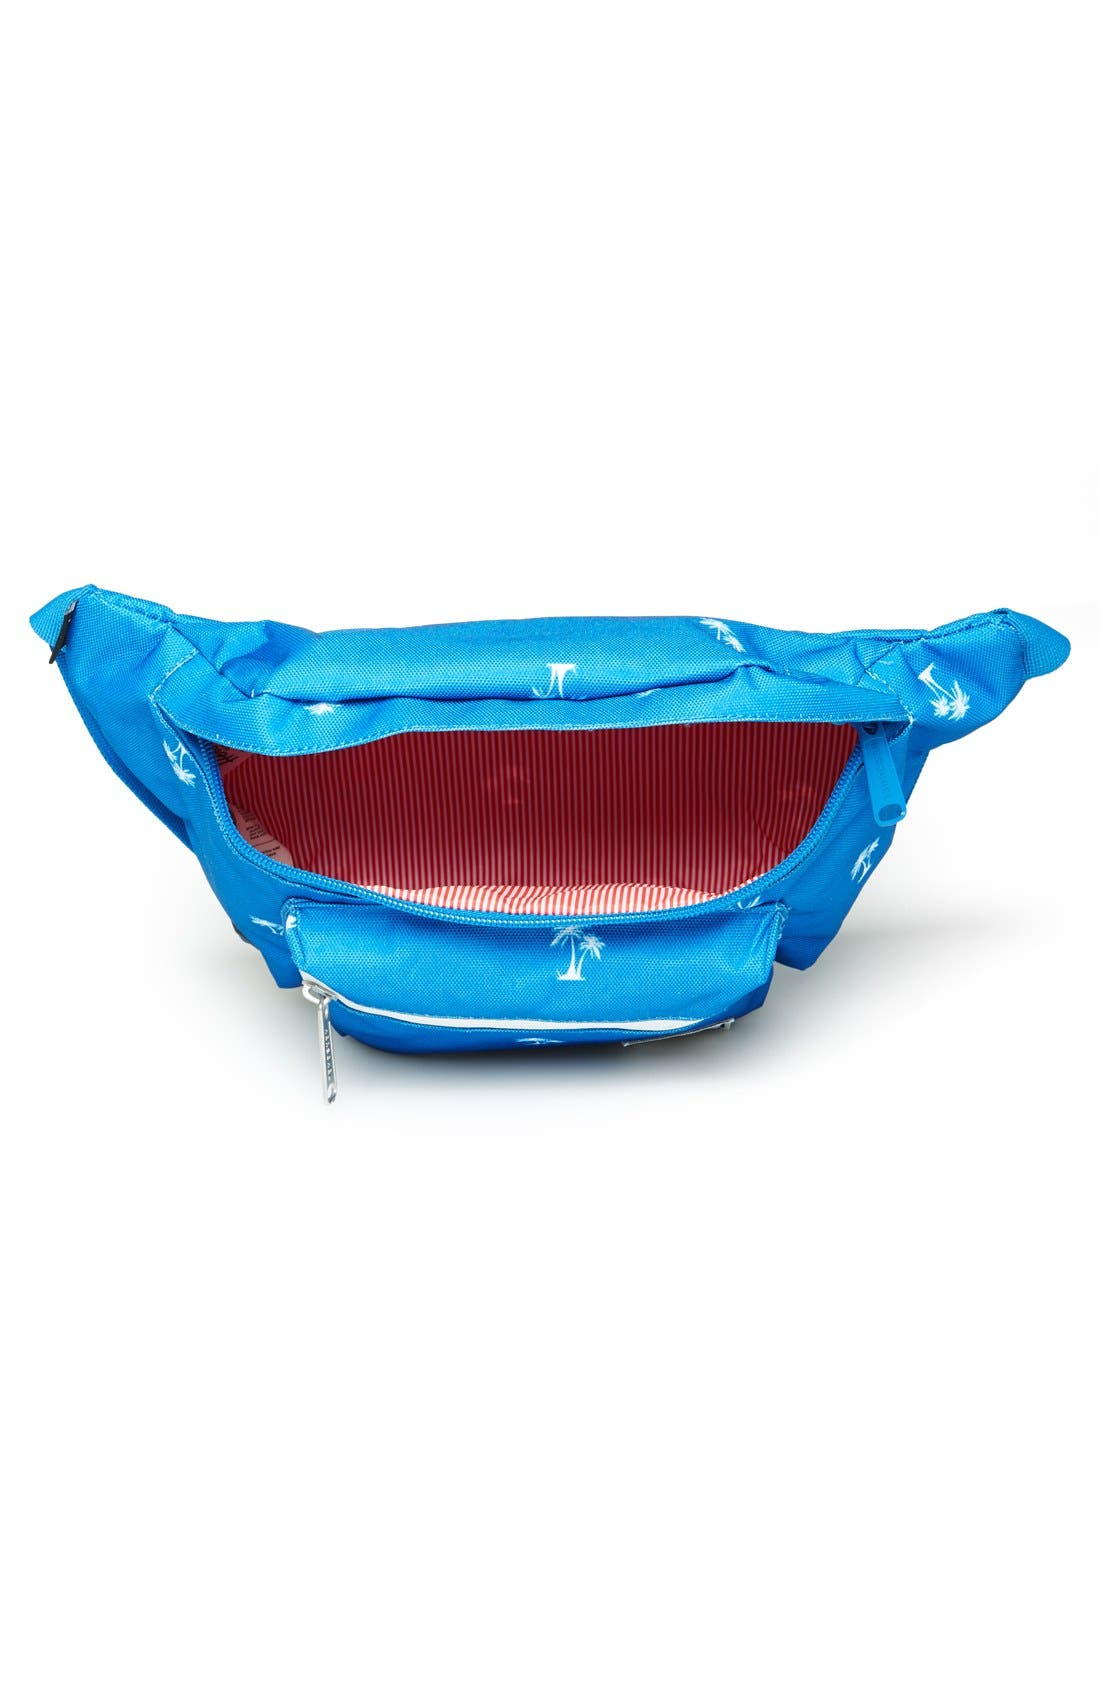 Alternate Image 3  - Herschel Supply Co. 'Seventeen' Belt Bag